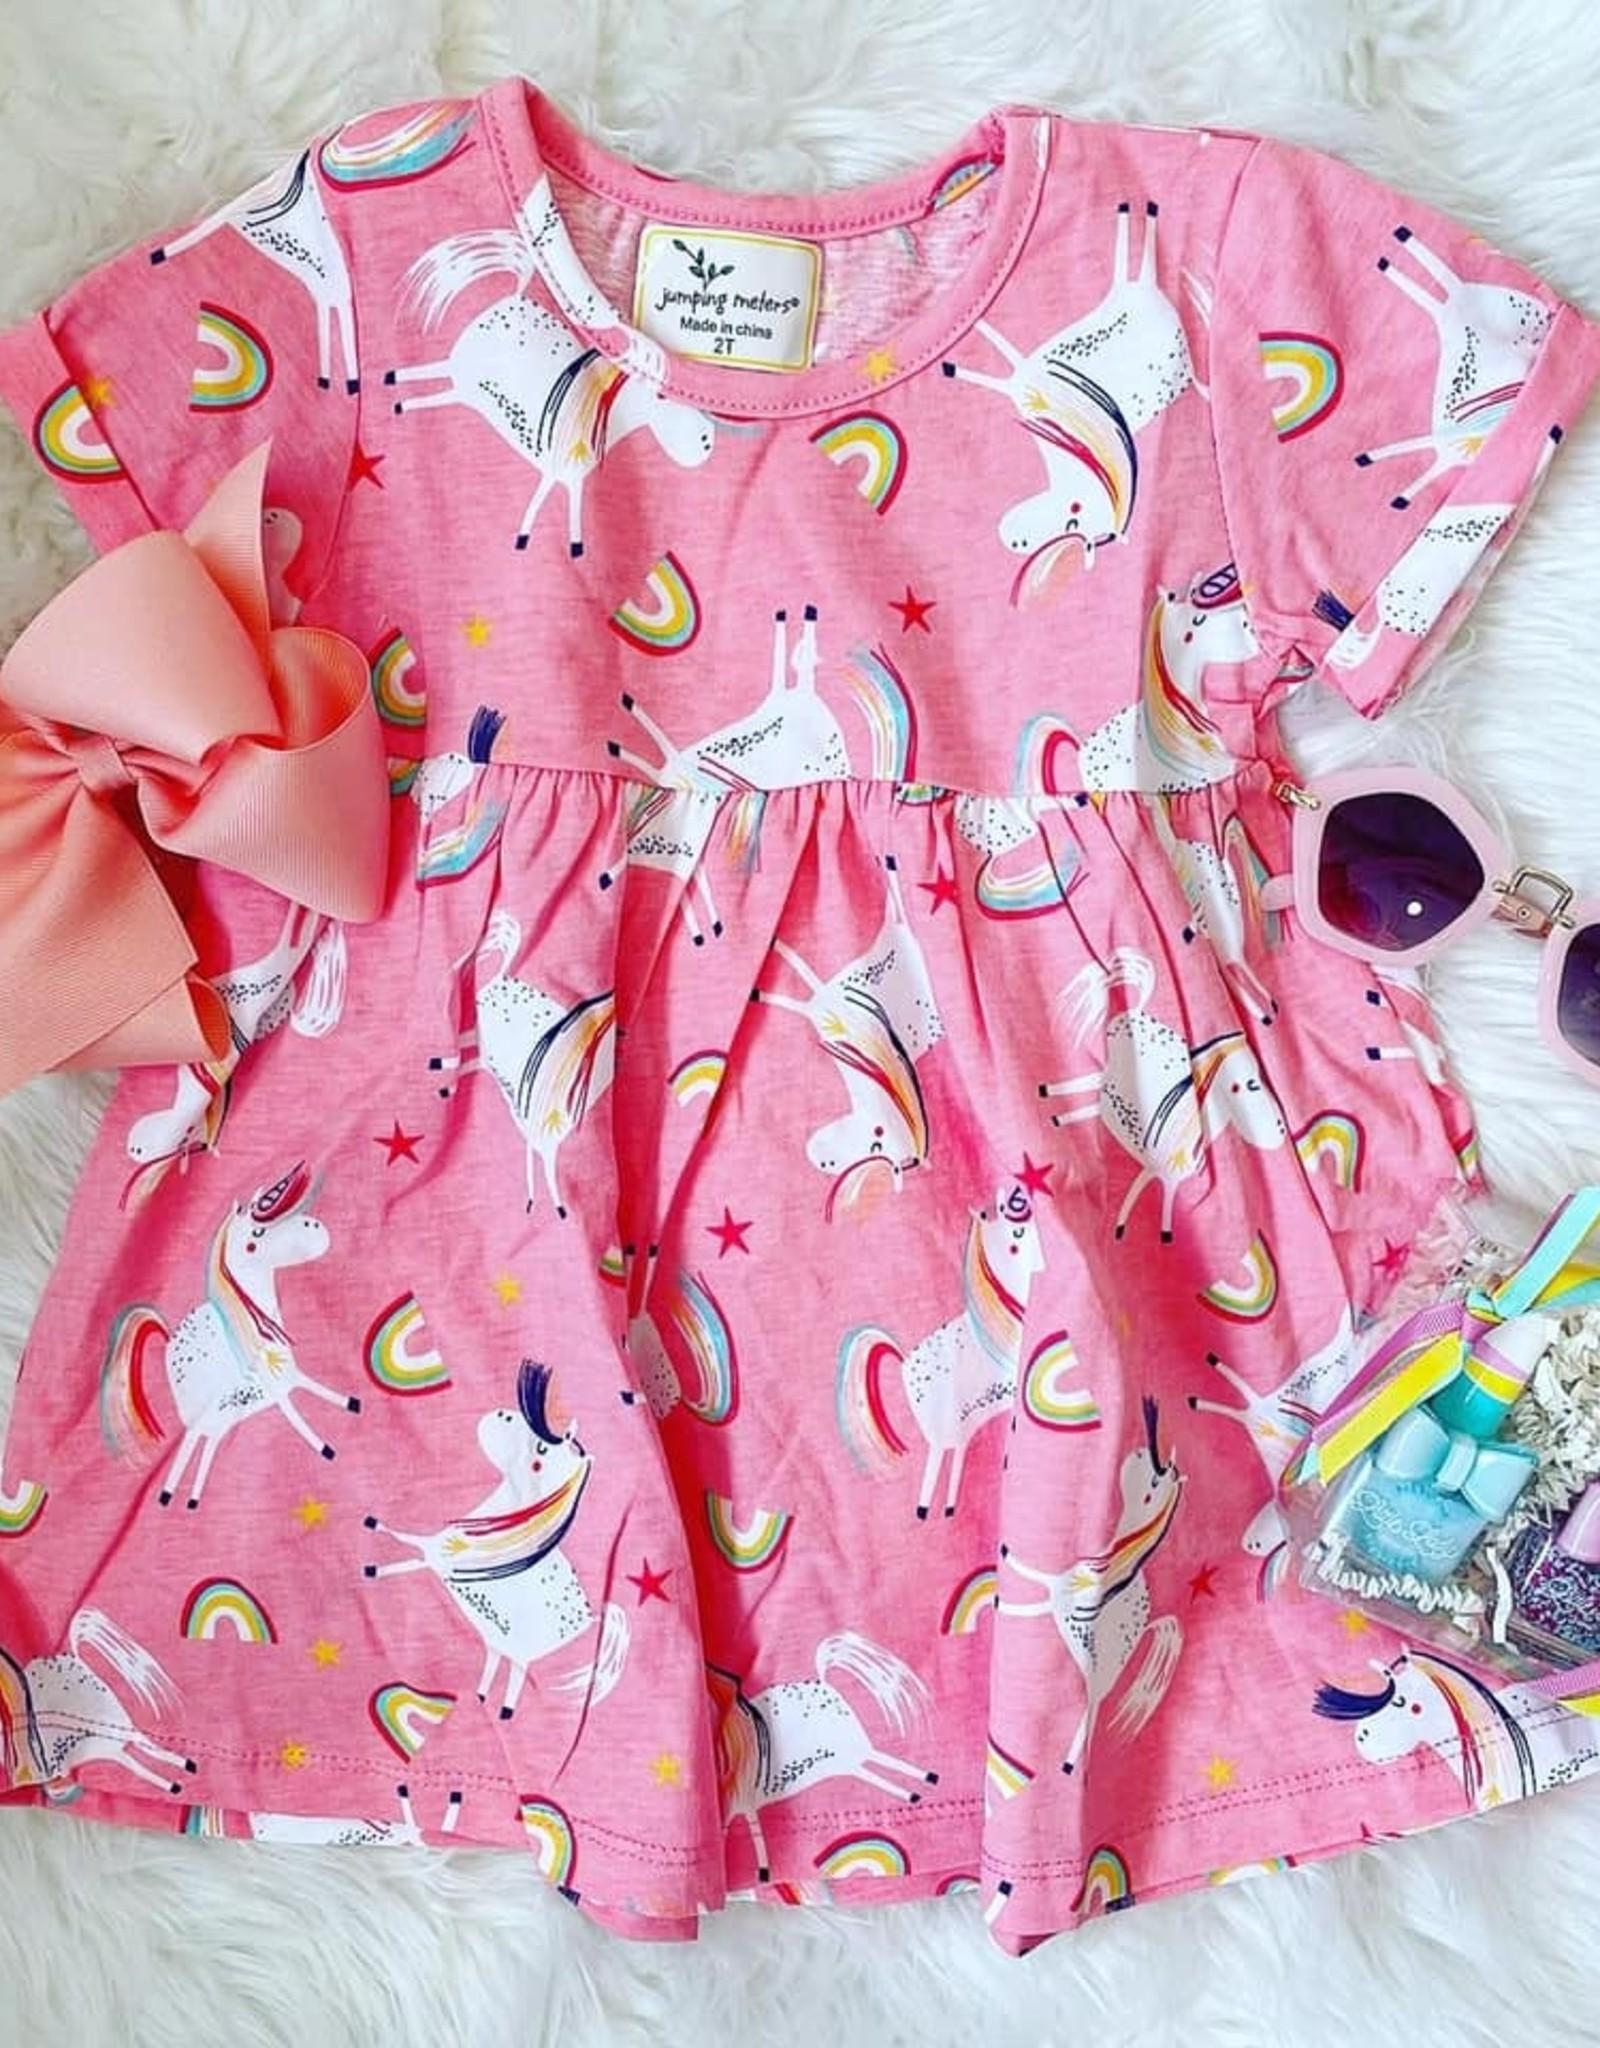 Bailey Unicorn Dress in Peach